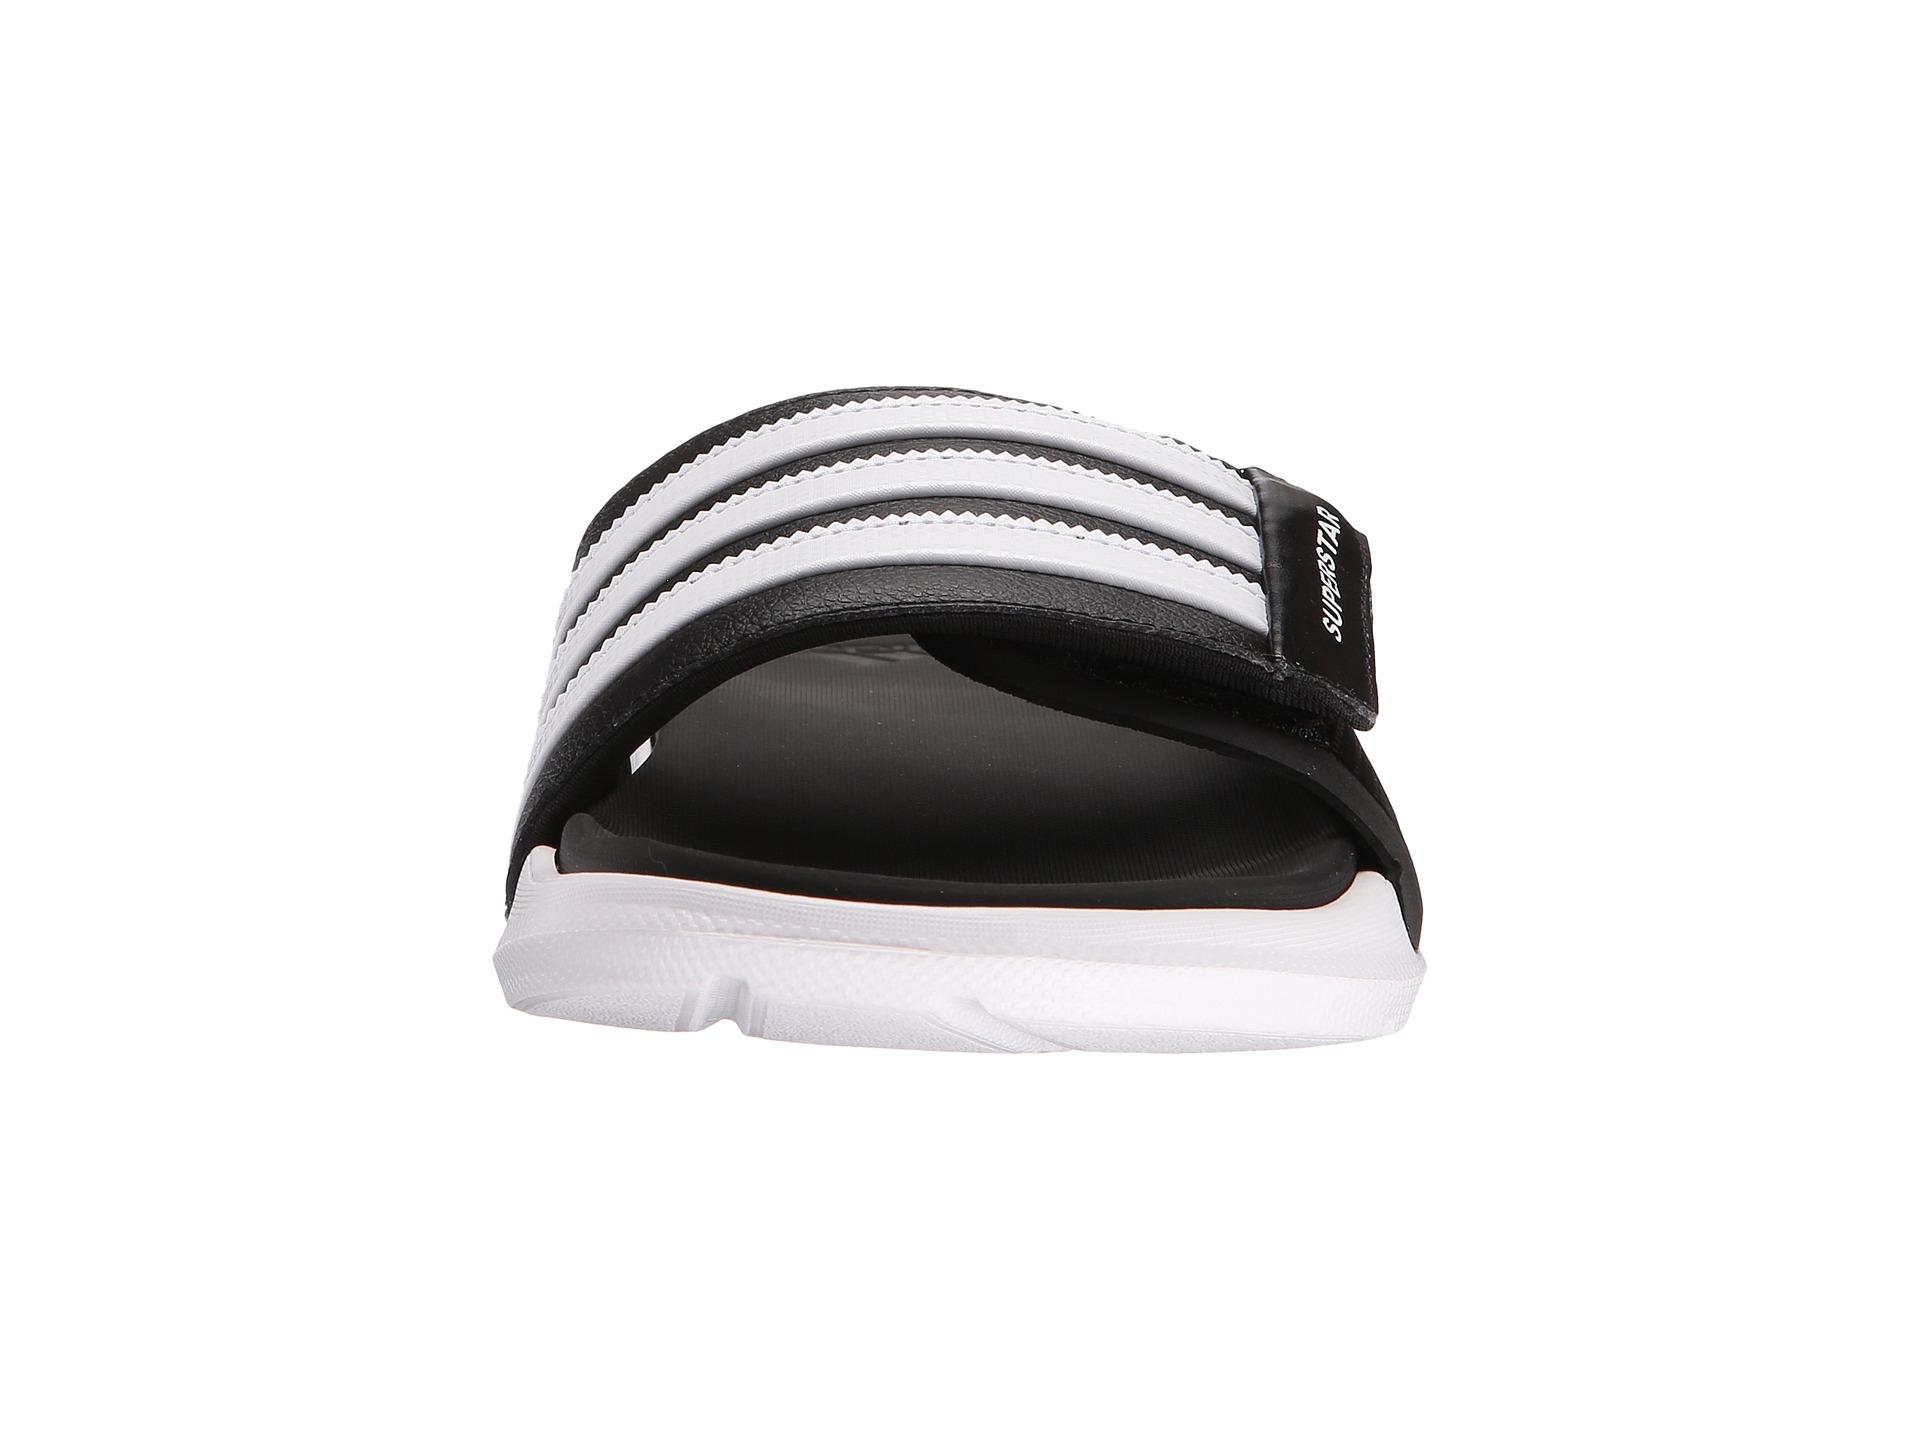 Lyst - adidas Originals Superstar 4g M in Black for Men 6a413e929